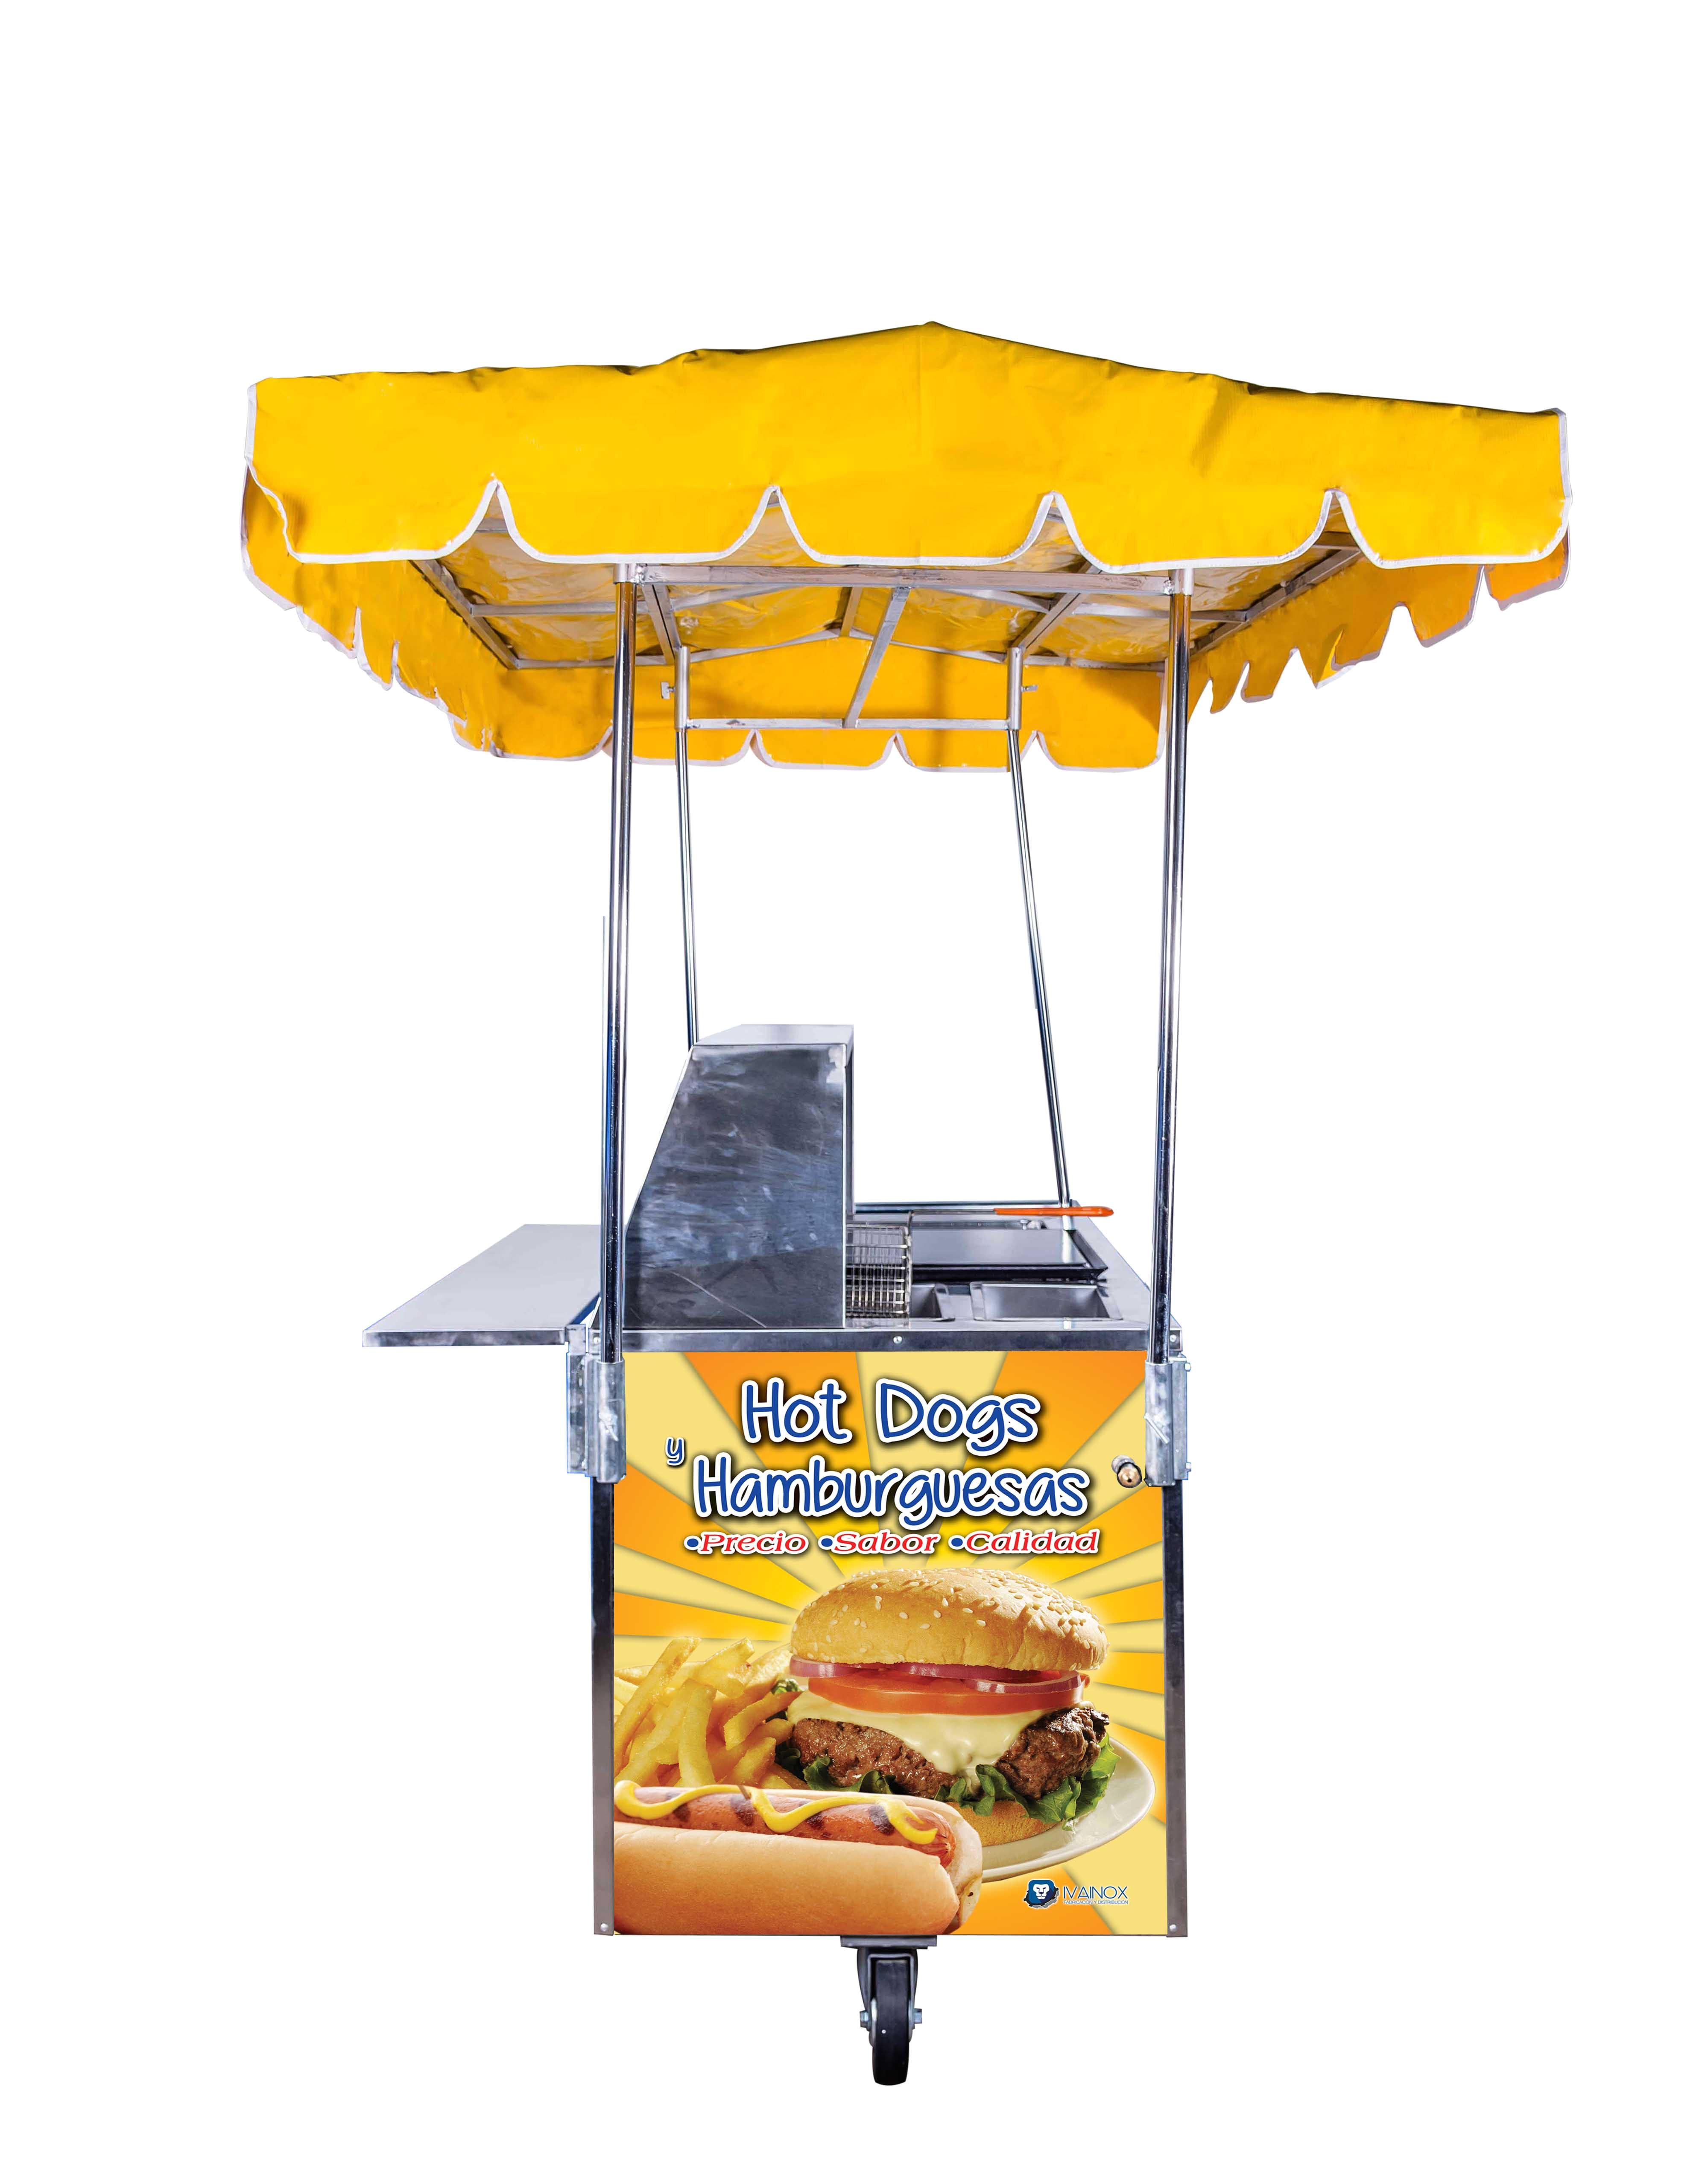 carrito para hot dog y hamburguesas chg 124